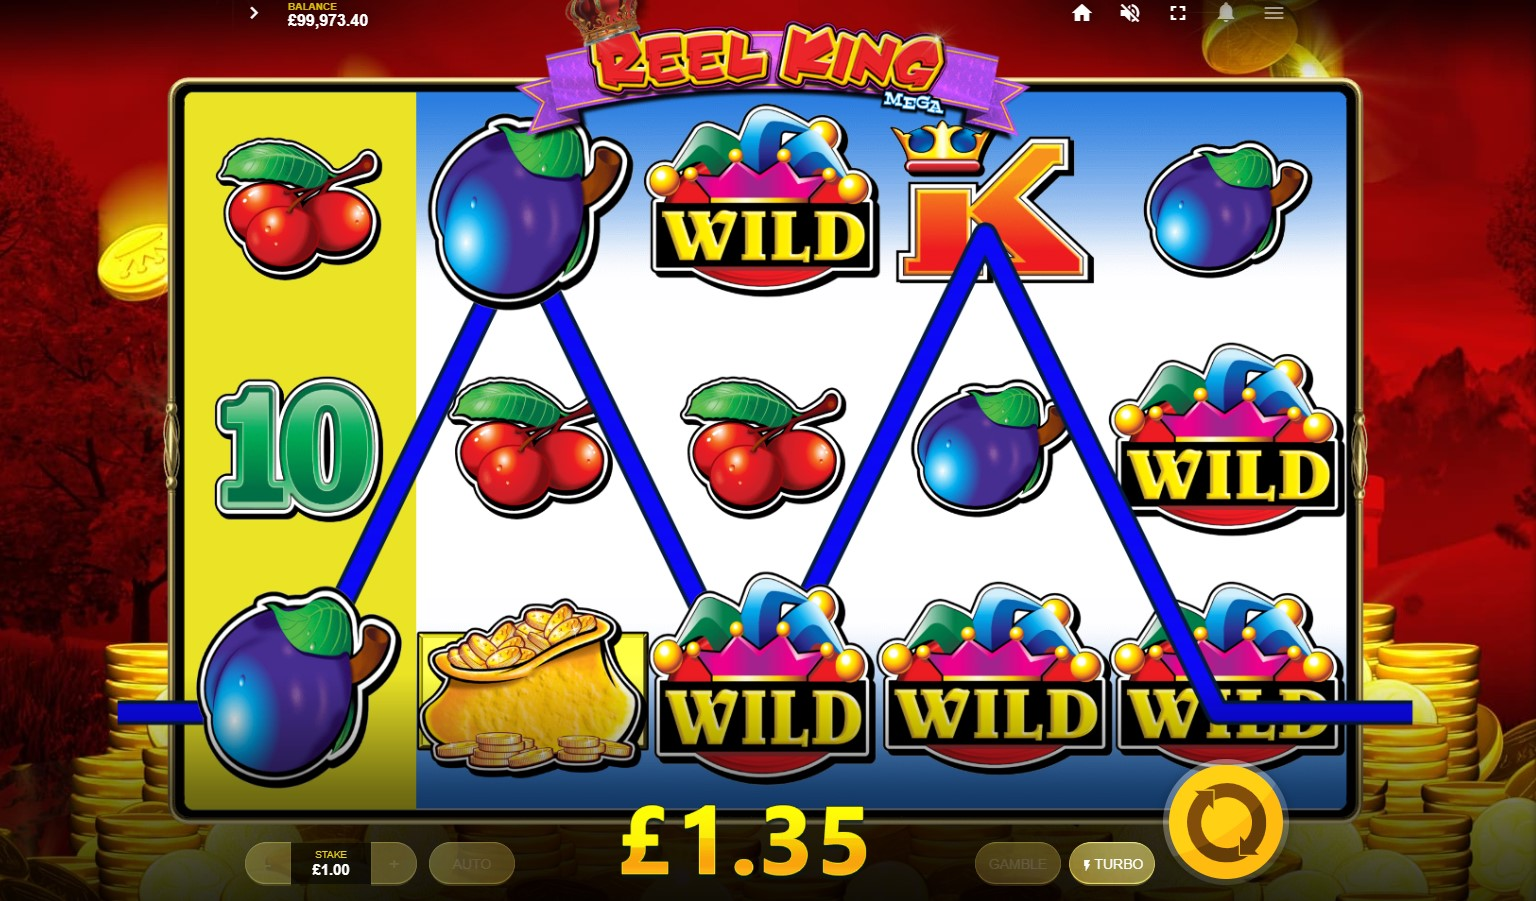 Wild symbol win during Reel King Mega online slot game